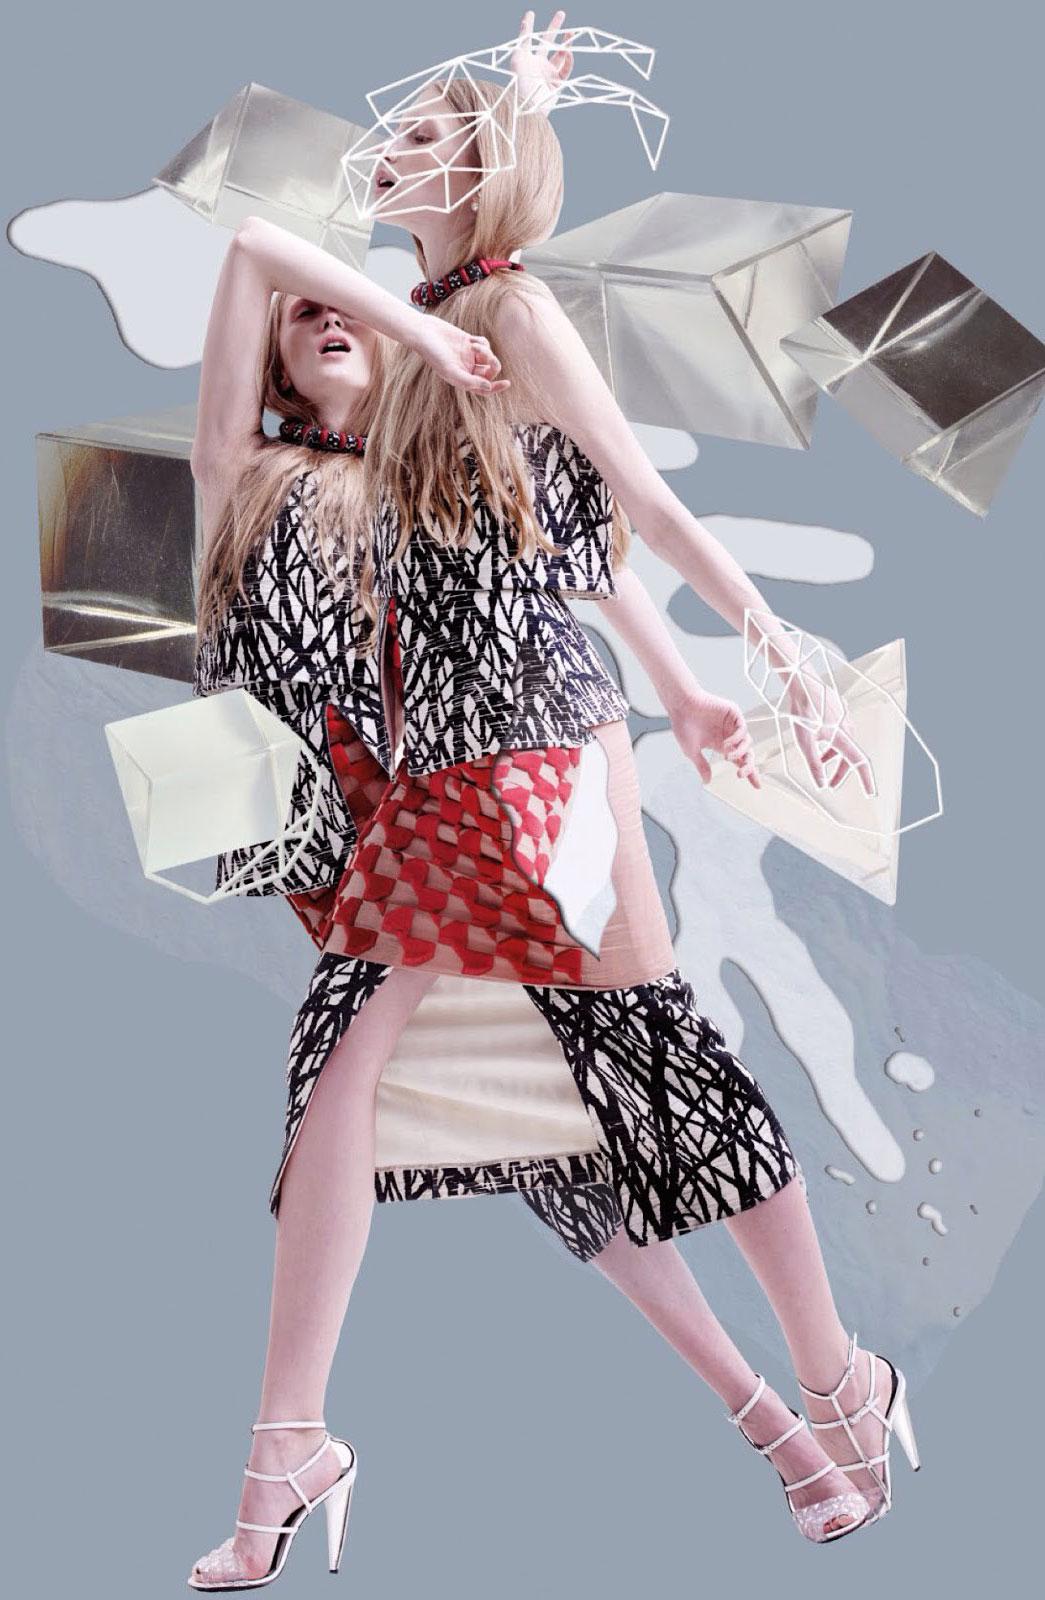 Karolina Sikorska in Out of imagination | Vogue Thailand May 2014 (photography: Nat Prakobsantisuk, styling: Jirat Subpisankul)